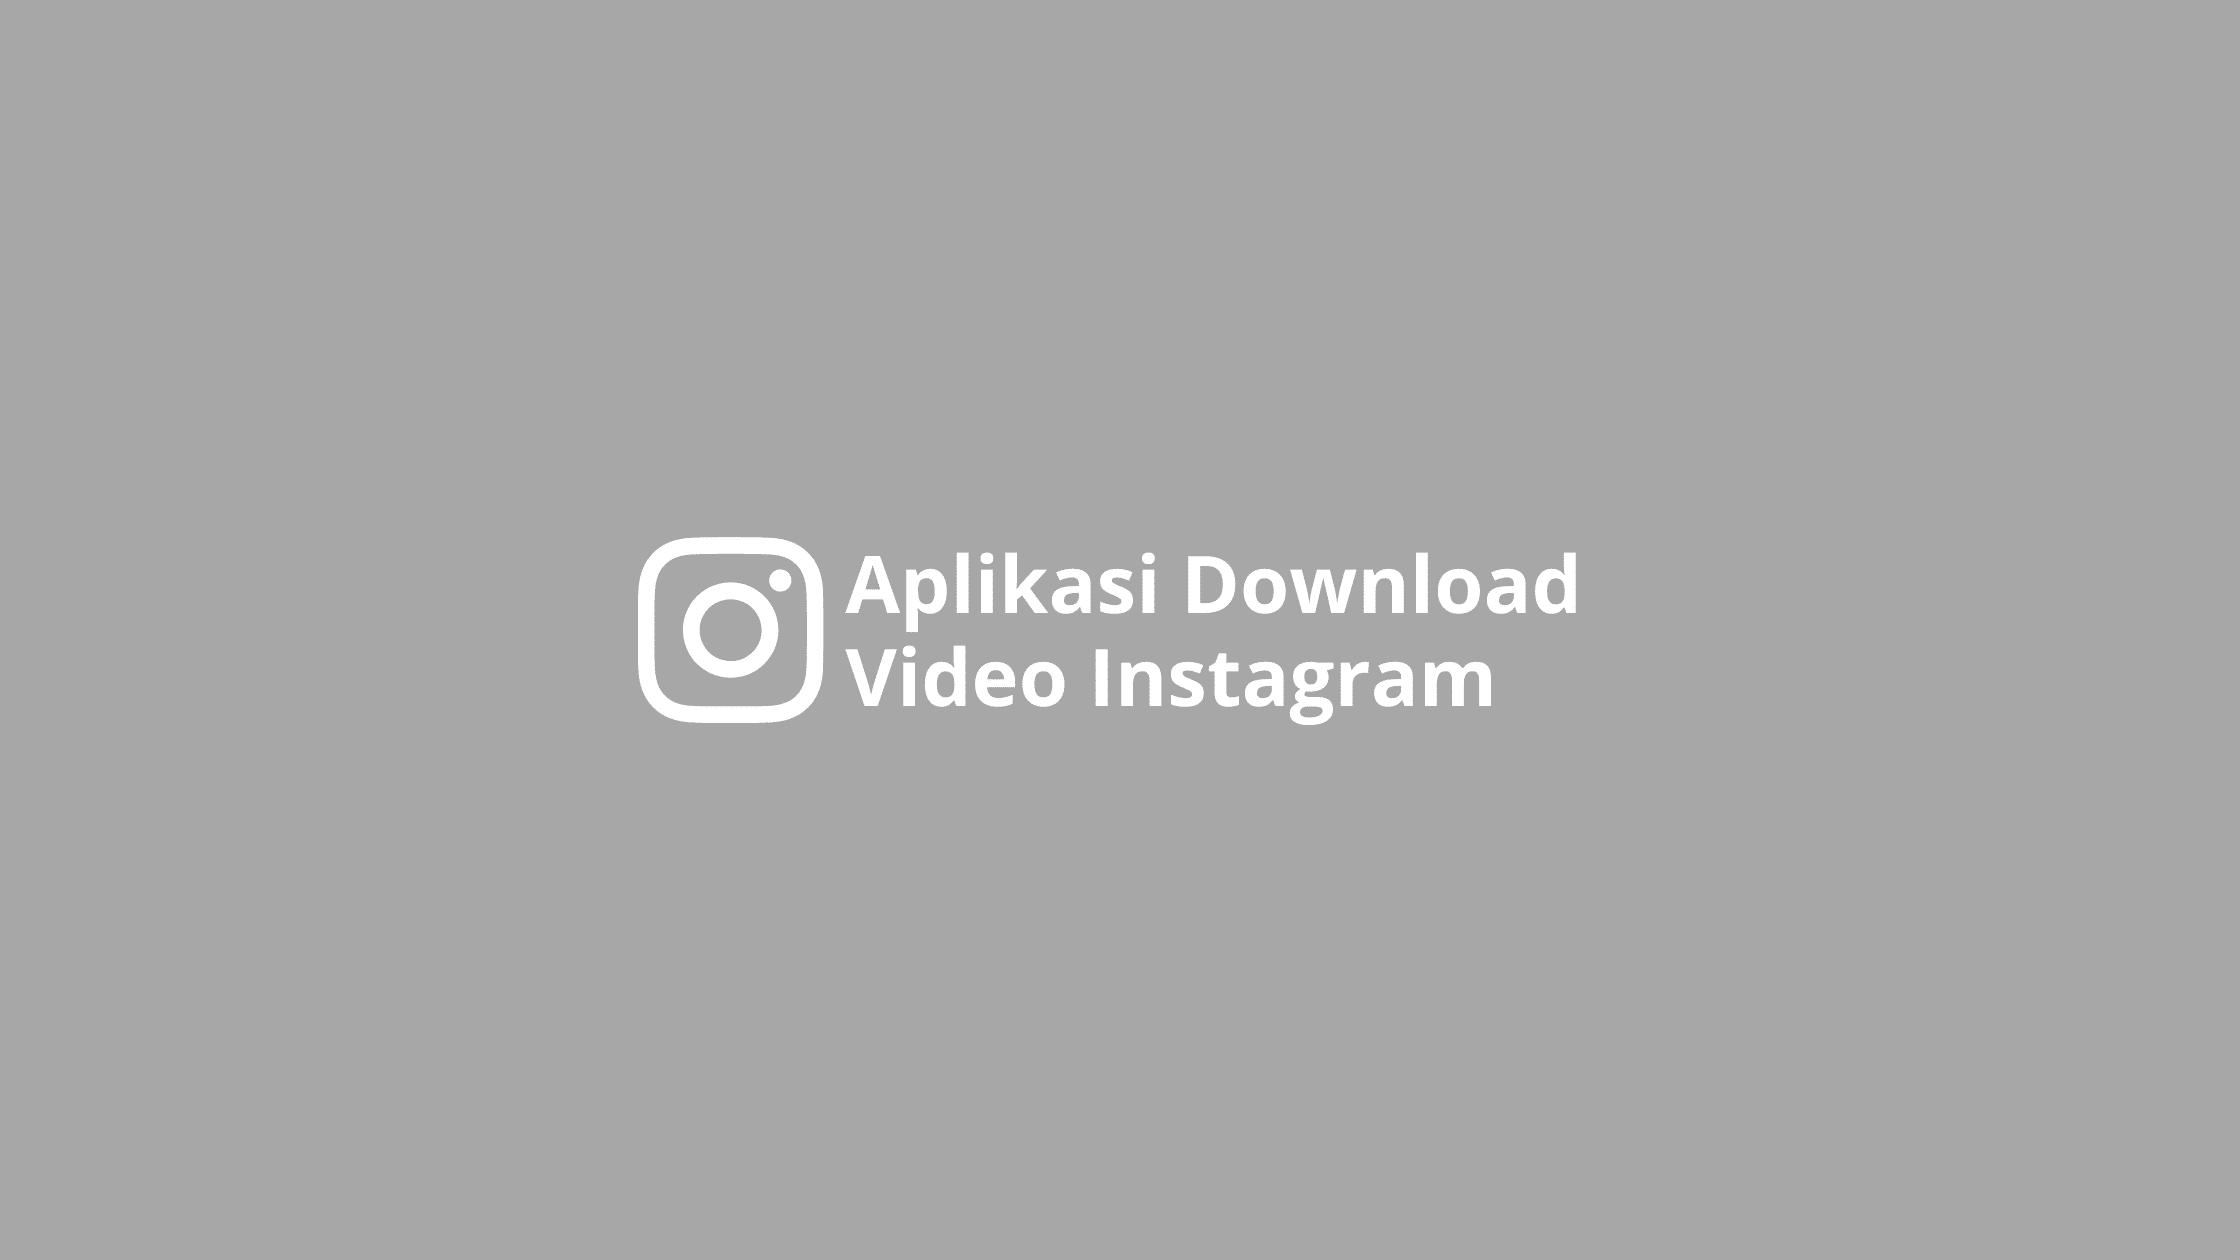 aplikasi download video instagram iphone